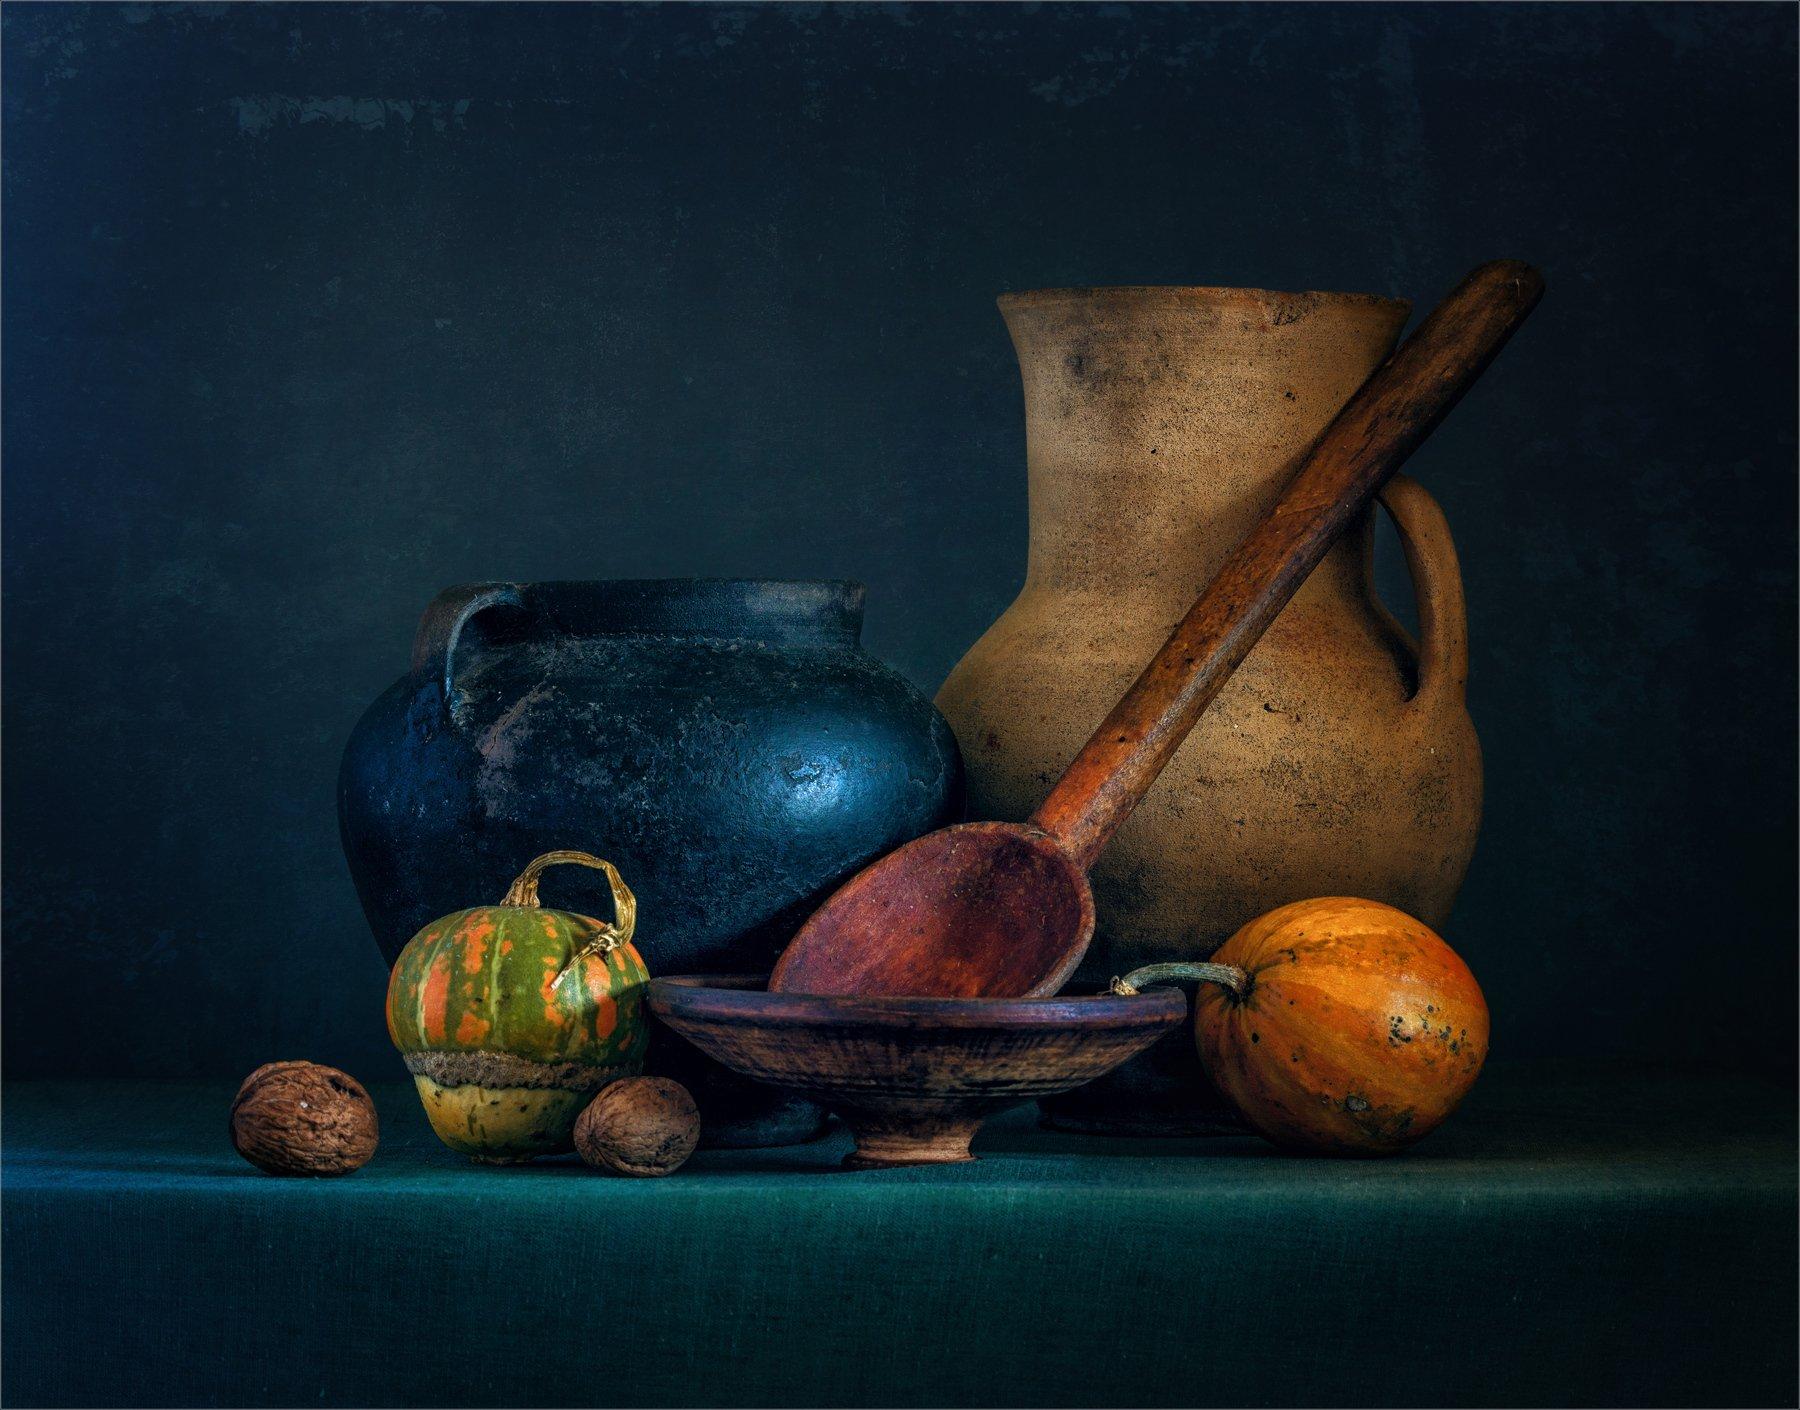 still life, натюрморт,   ретро, винтаж, кувшин, тыква, орехи, еда, ложка, деревянная ложка,, Михаил MSH